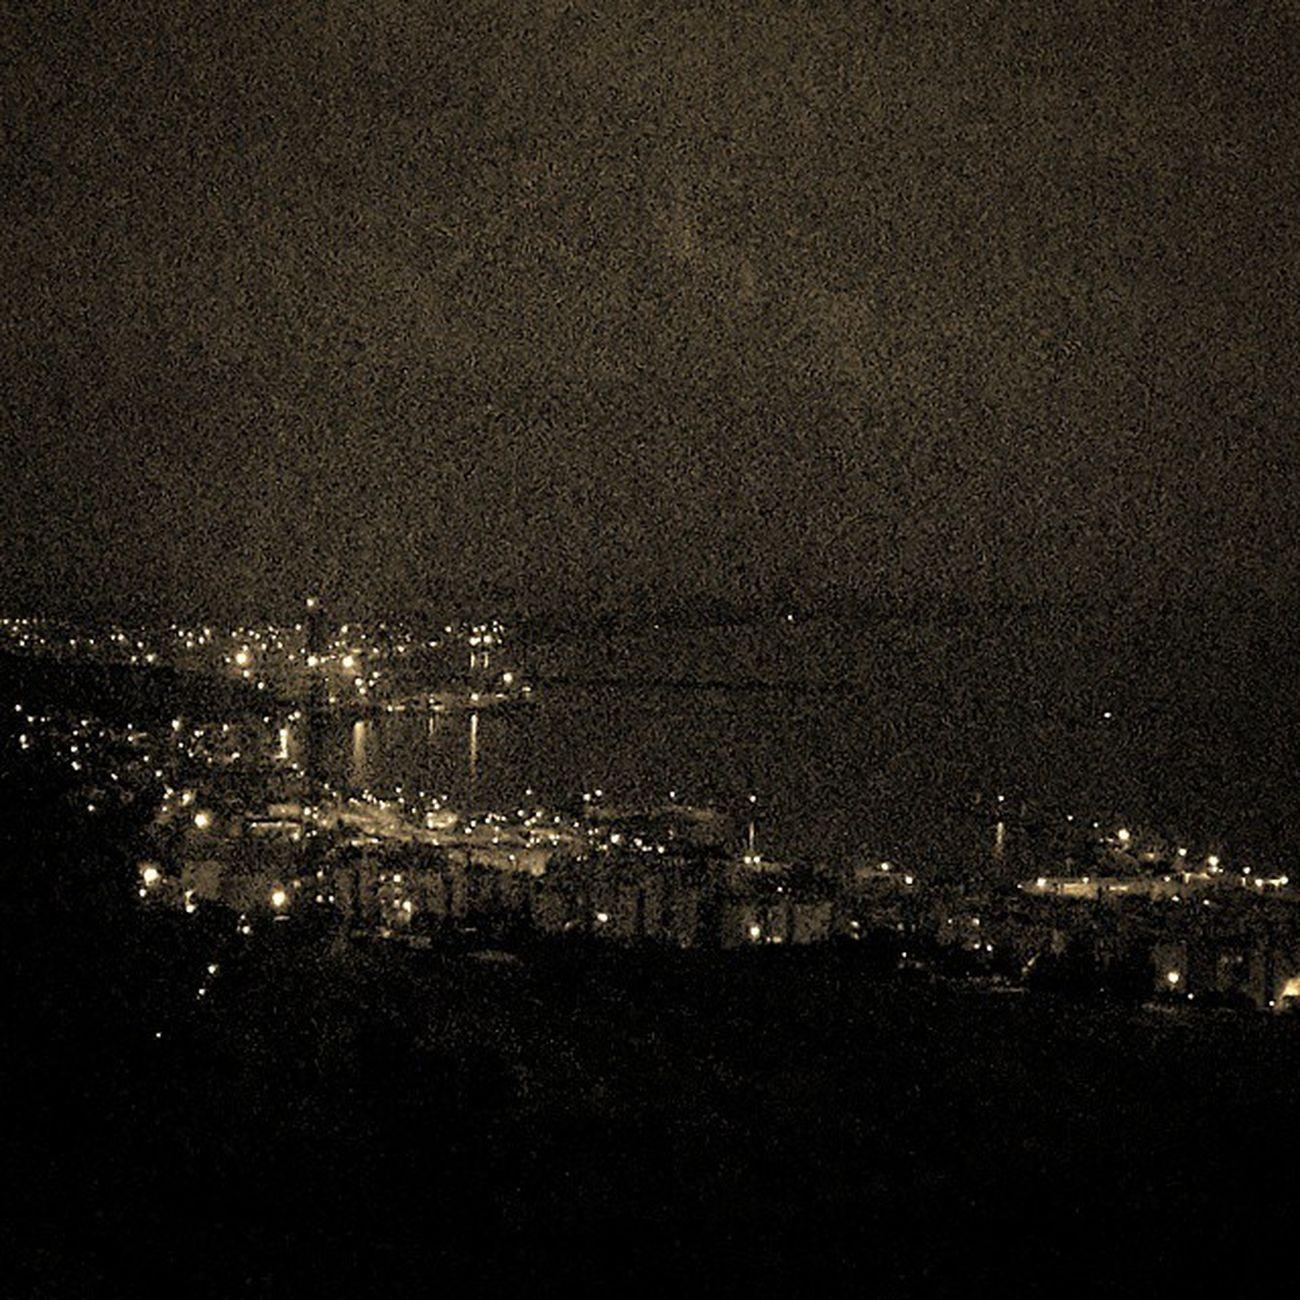 Gece Liman Tasucu